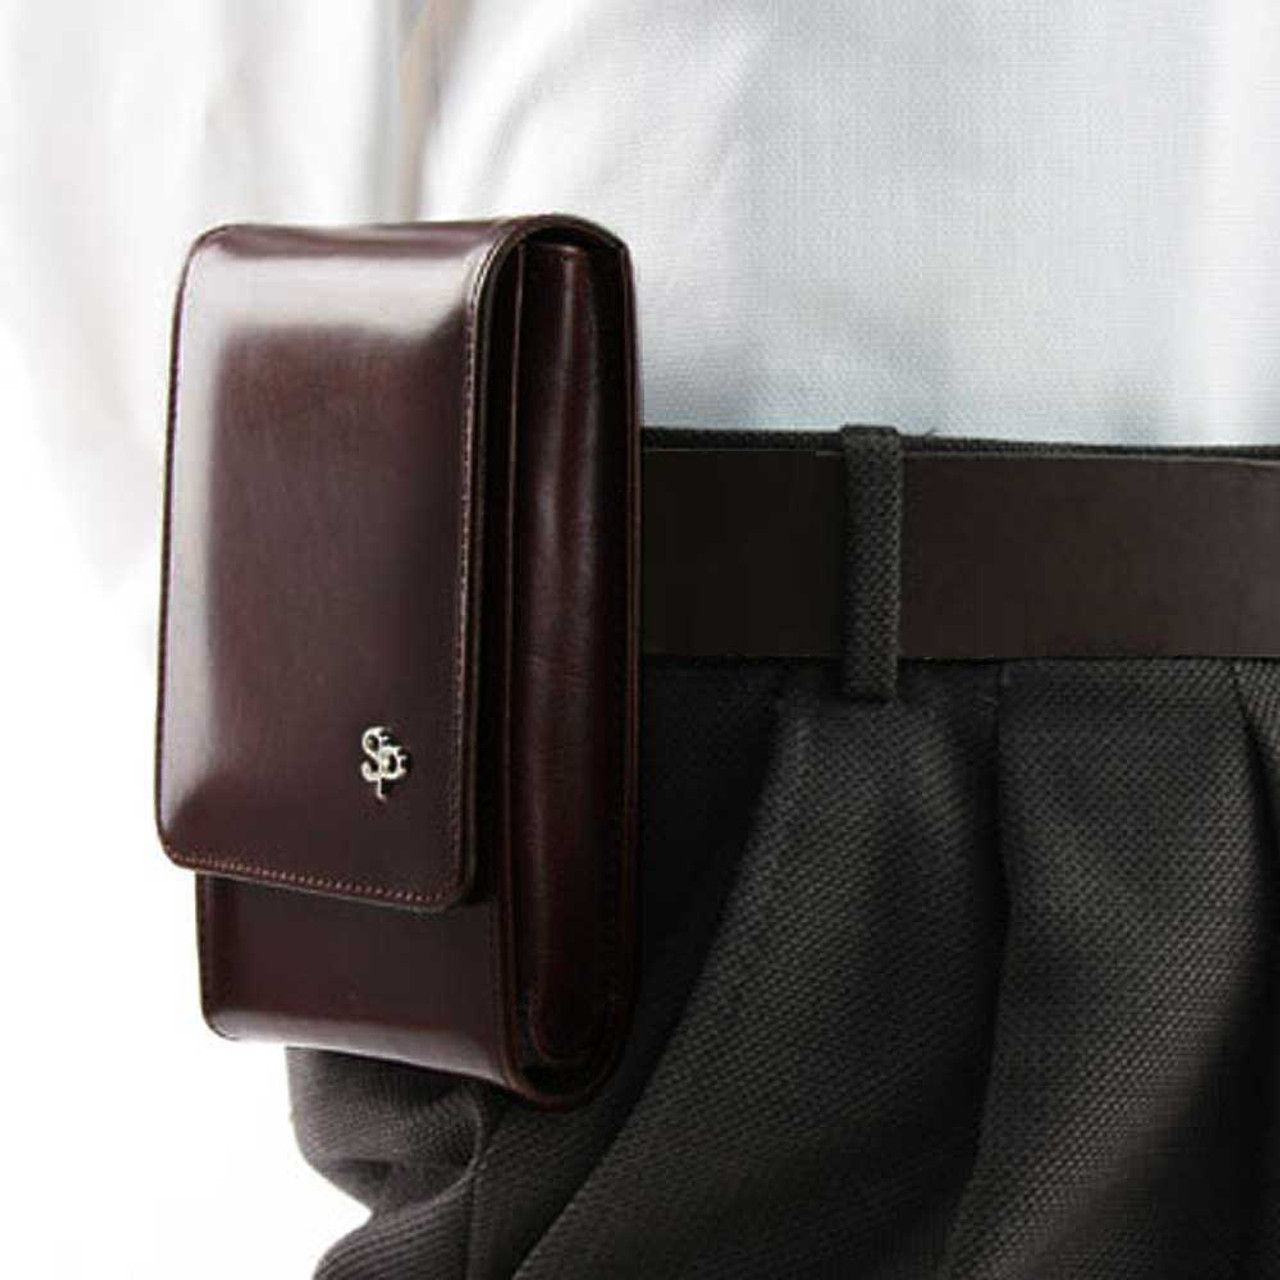 Diamondback DB9 Sneaky Pete Holster (Belt Clip)